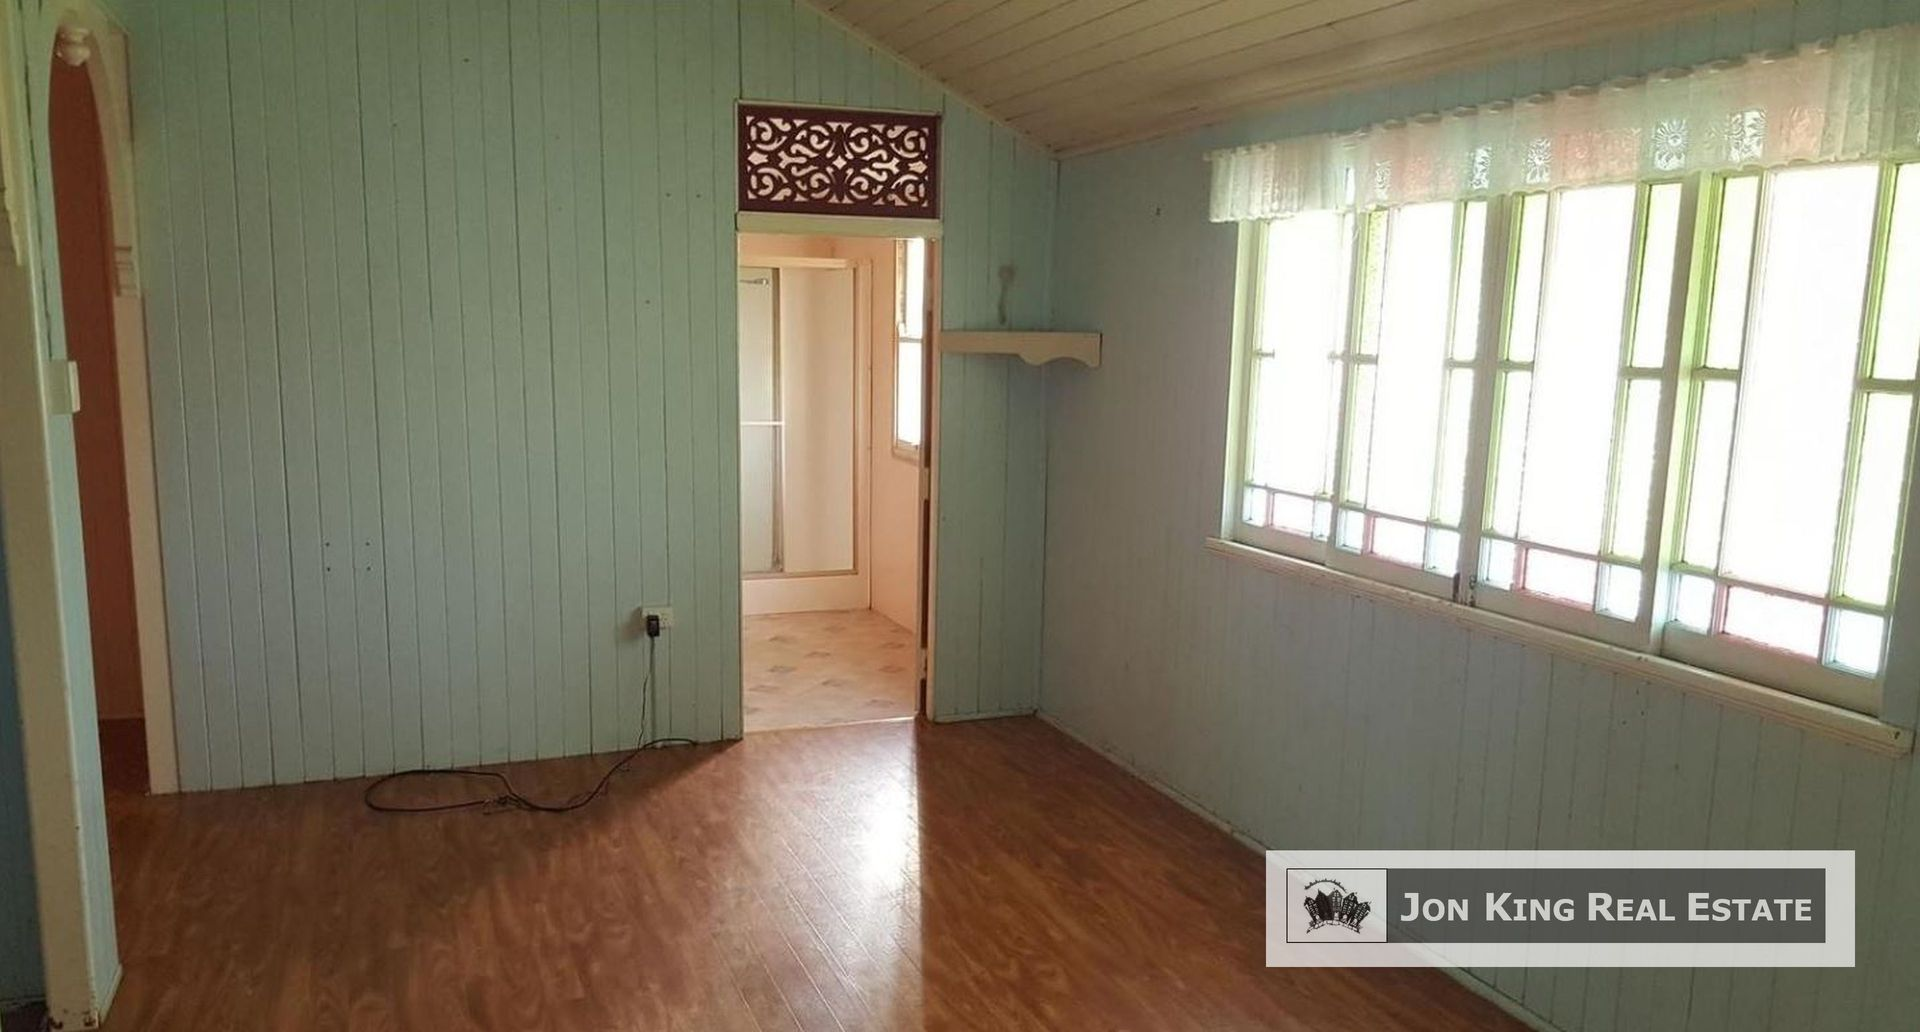 504 Kulgun Rd, Obum Obum QLD 4309, Image 1